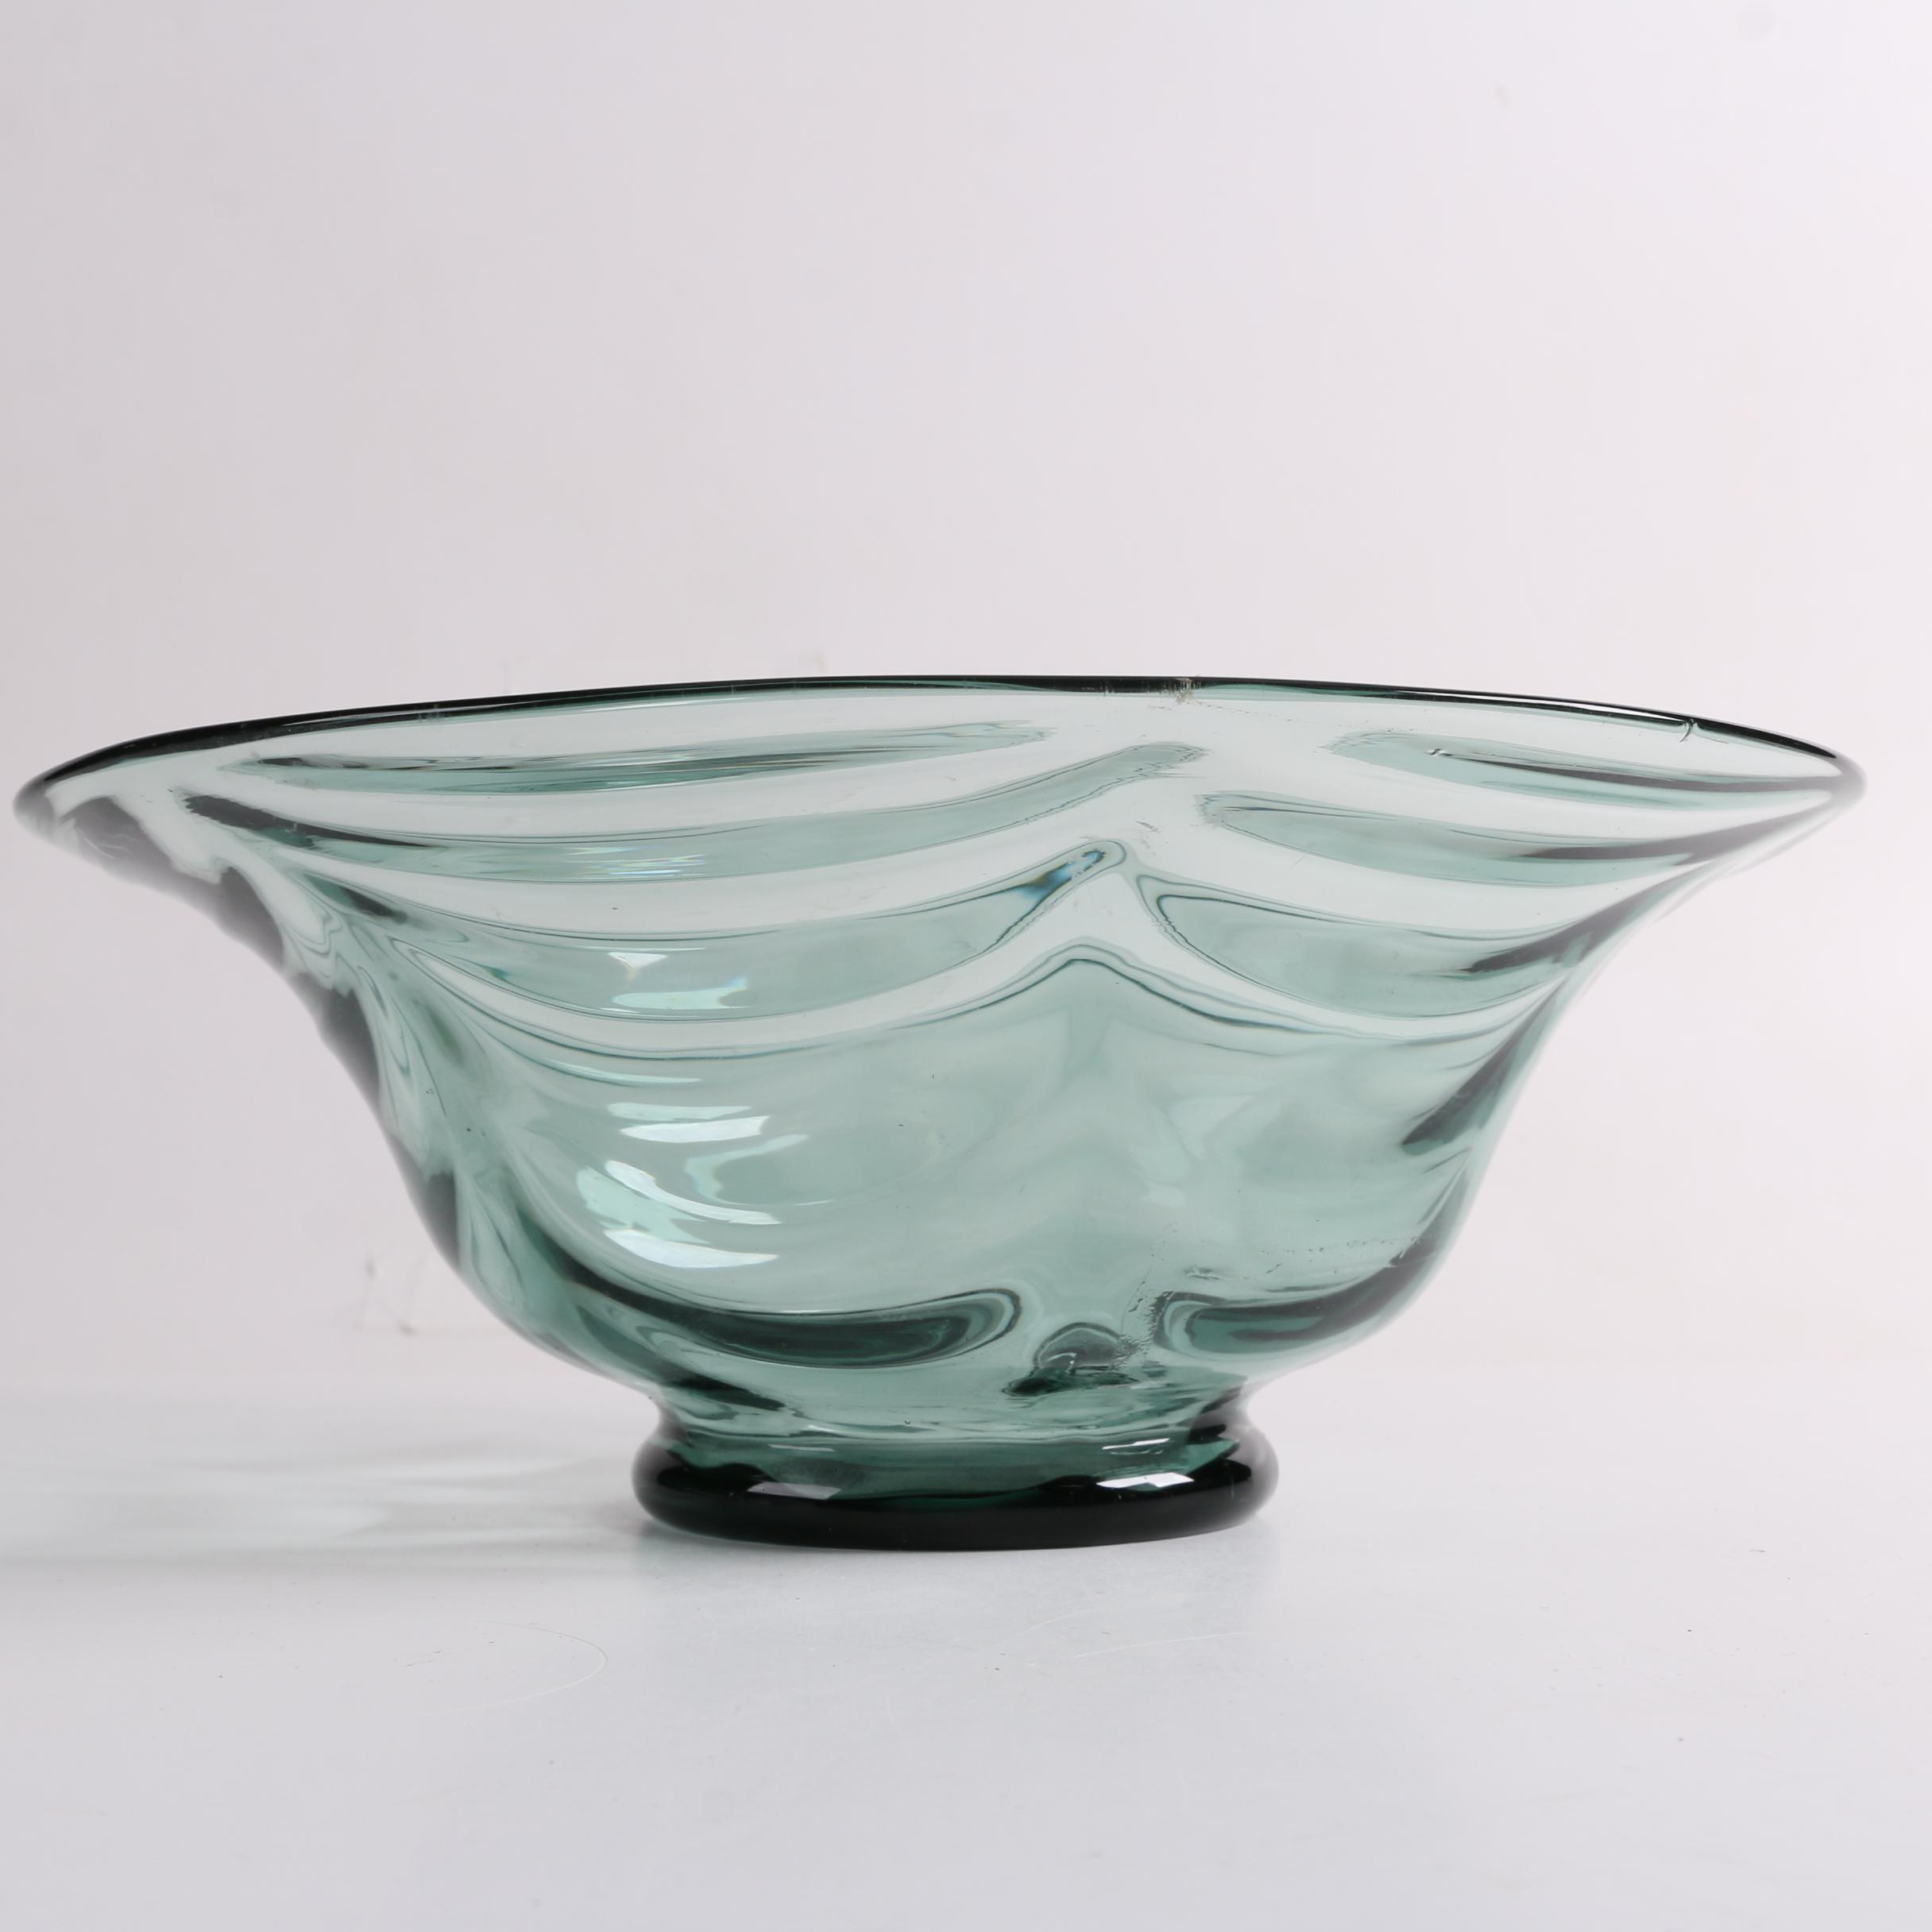 Steuben Draped Optic Blown Glass Bowl in Antique Green